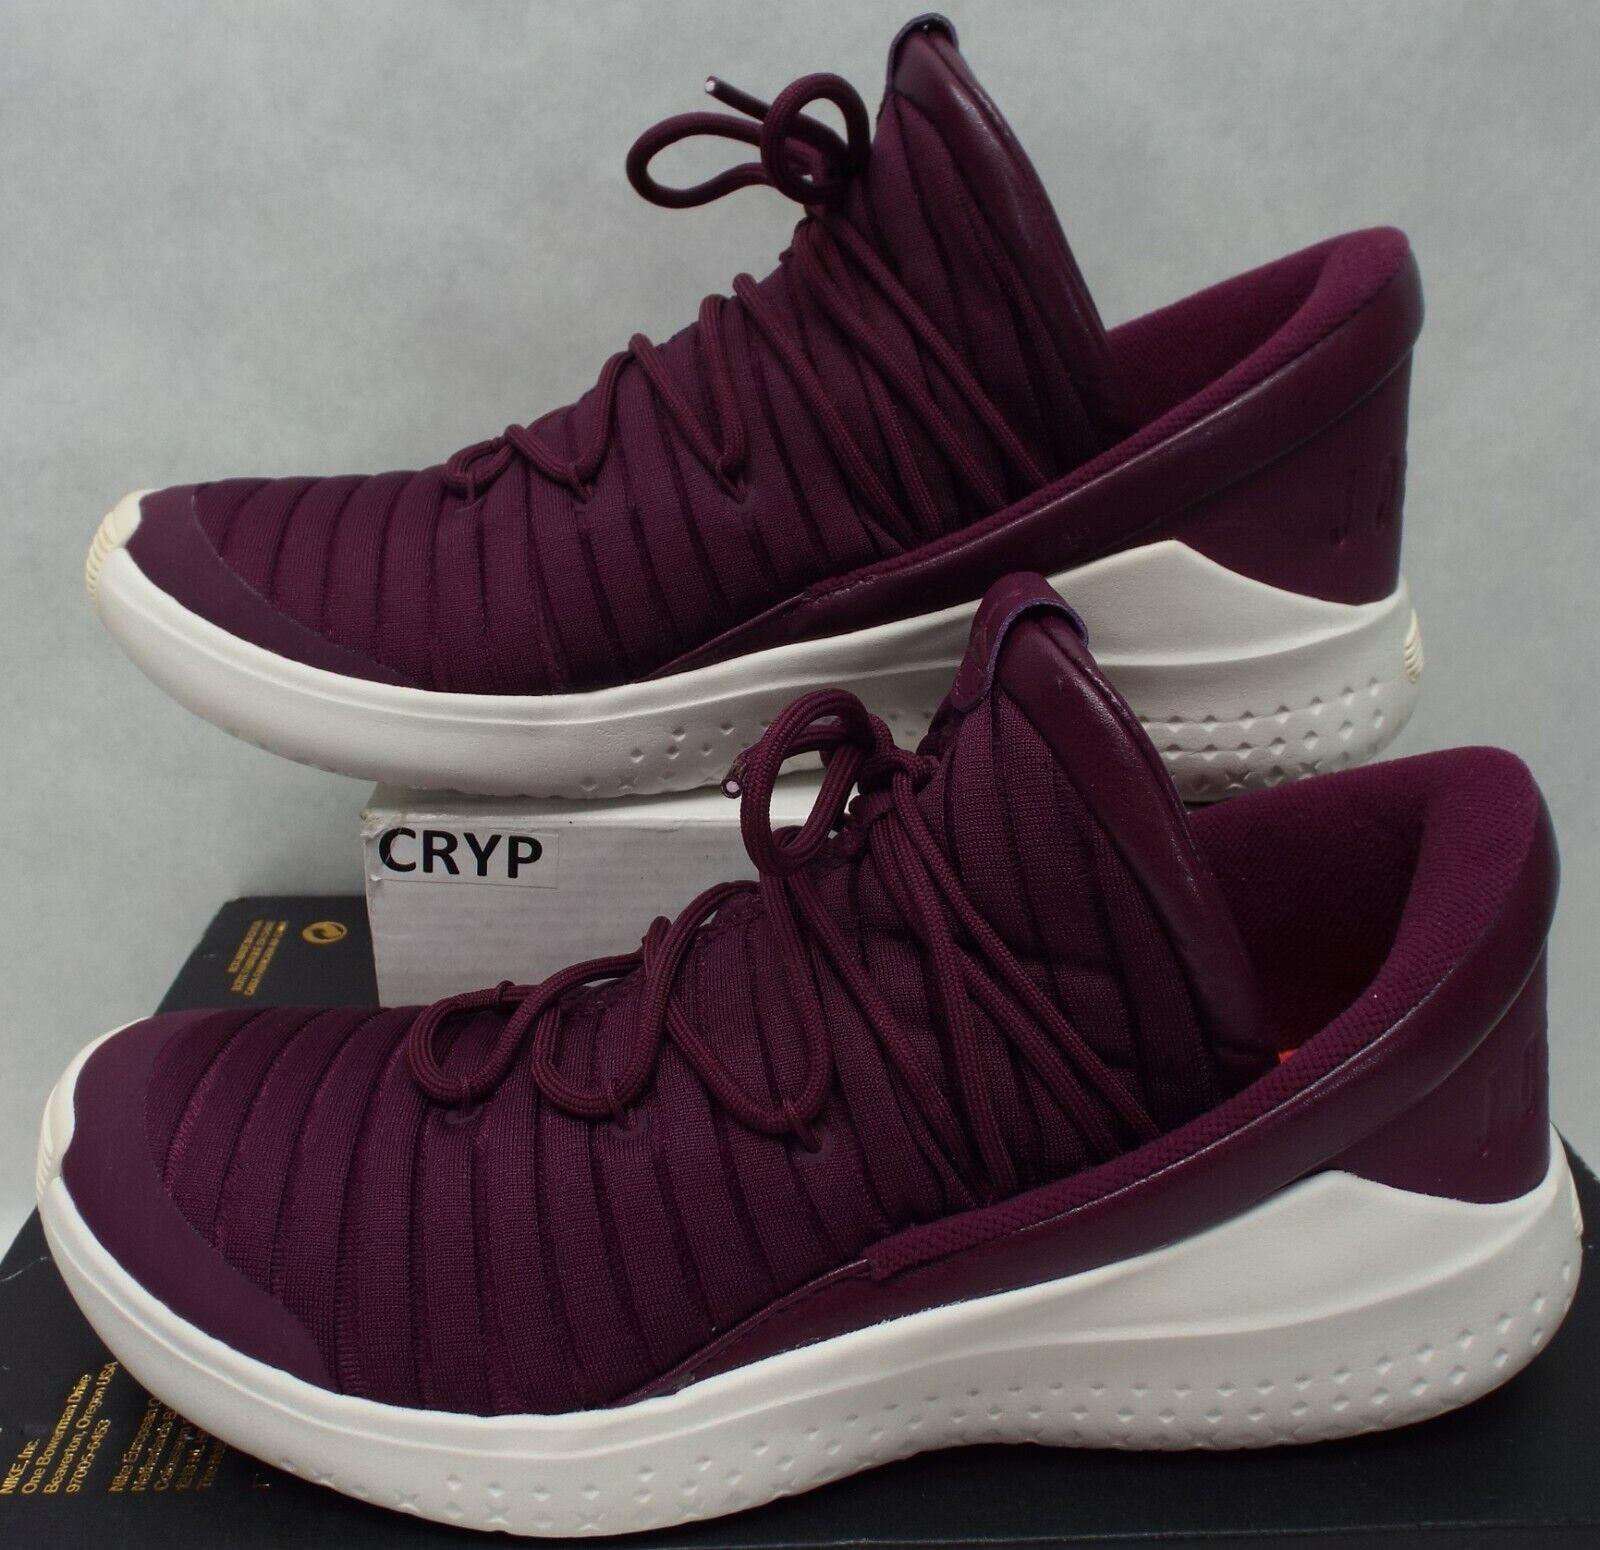 New Mens 12 NIKE Jordan Flight Luxe Bordeaux Basketball shoes  120 919715-637